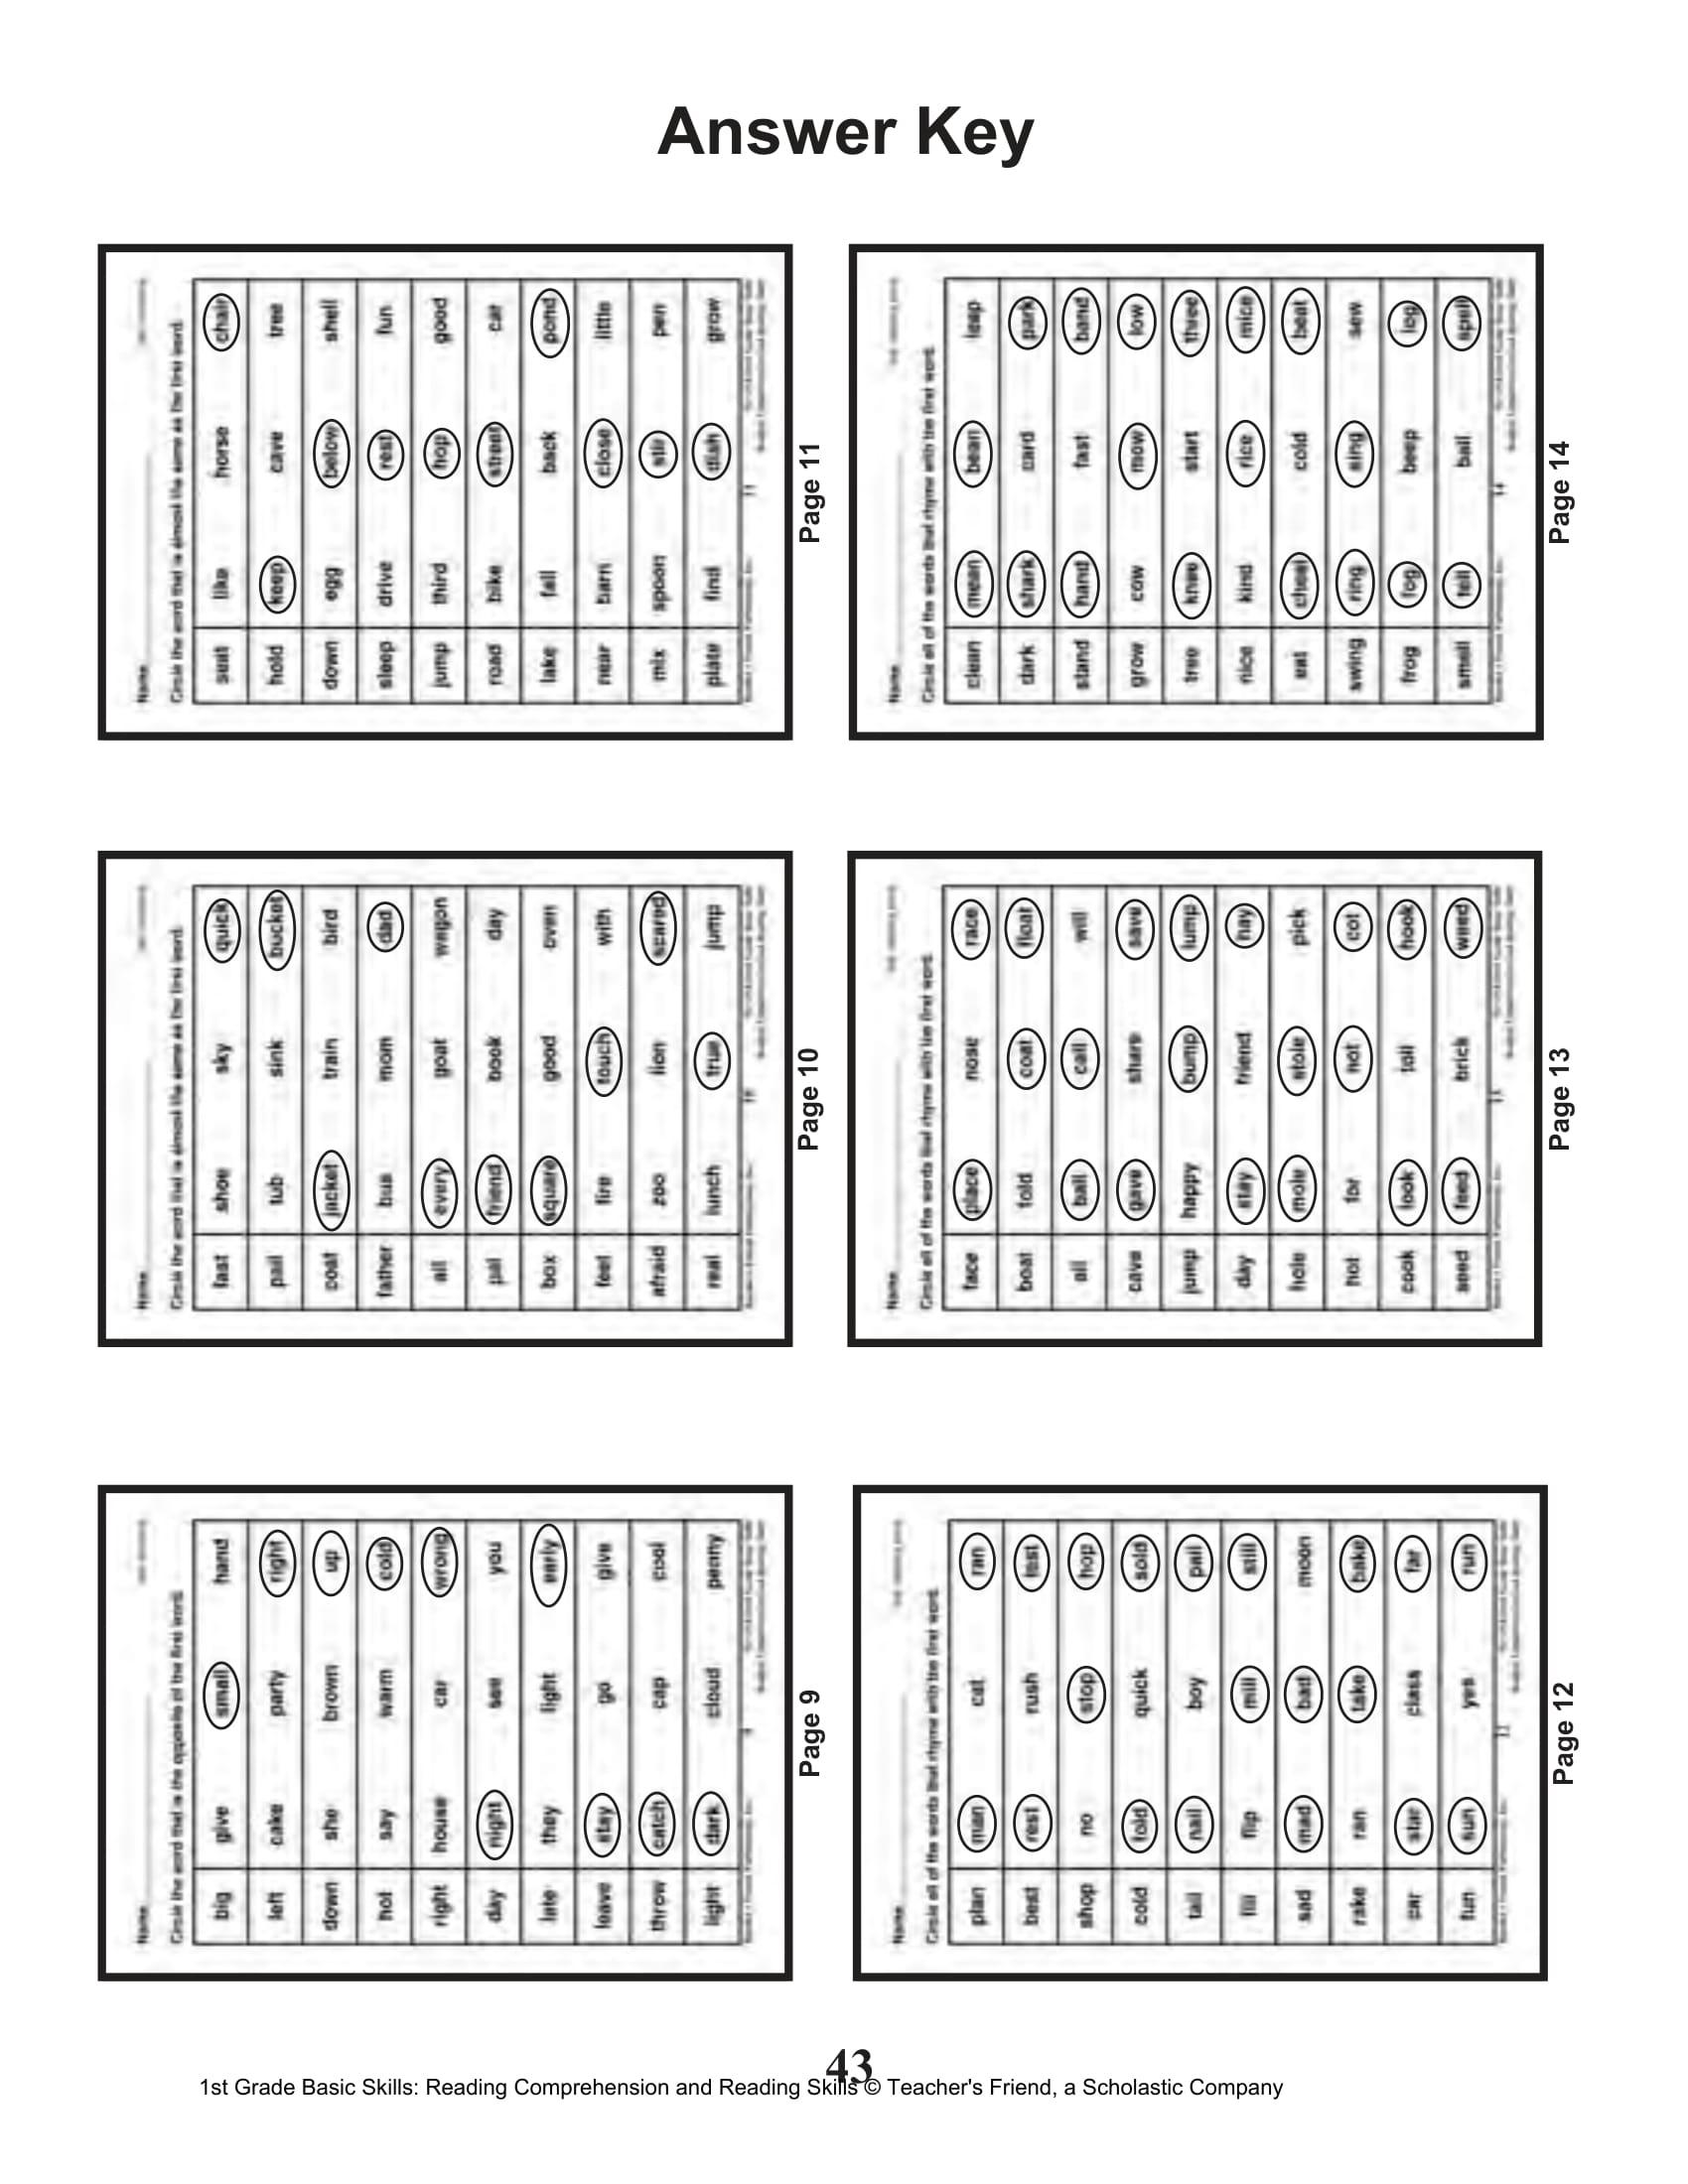 Scholastic 1st Grade Reading Comprehension Skills Worksheets 44